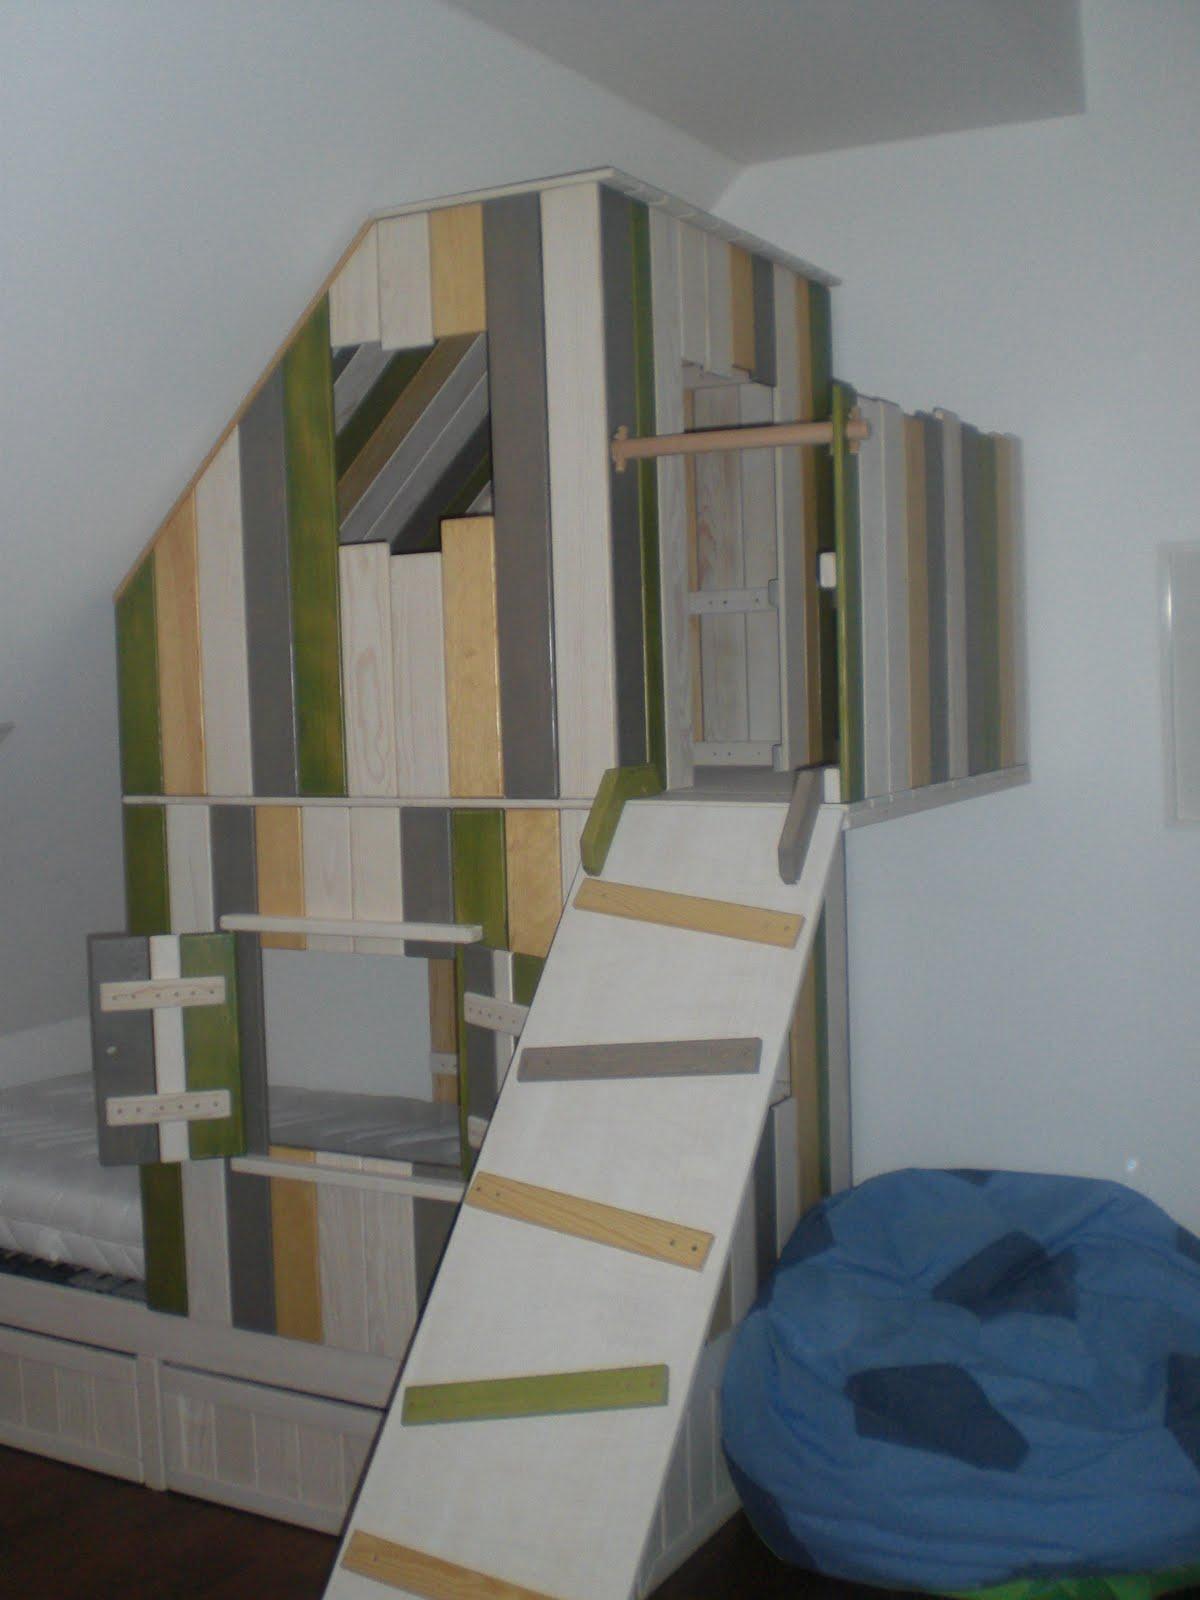 biotischler baumhaus f rs kinderzimmer. Black Bedroom Furniture Sets. Home Design Ideas